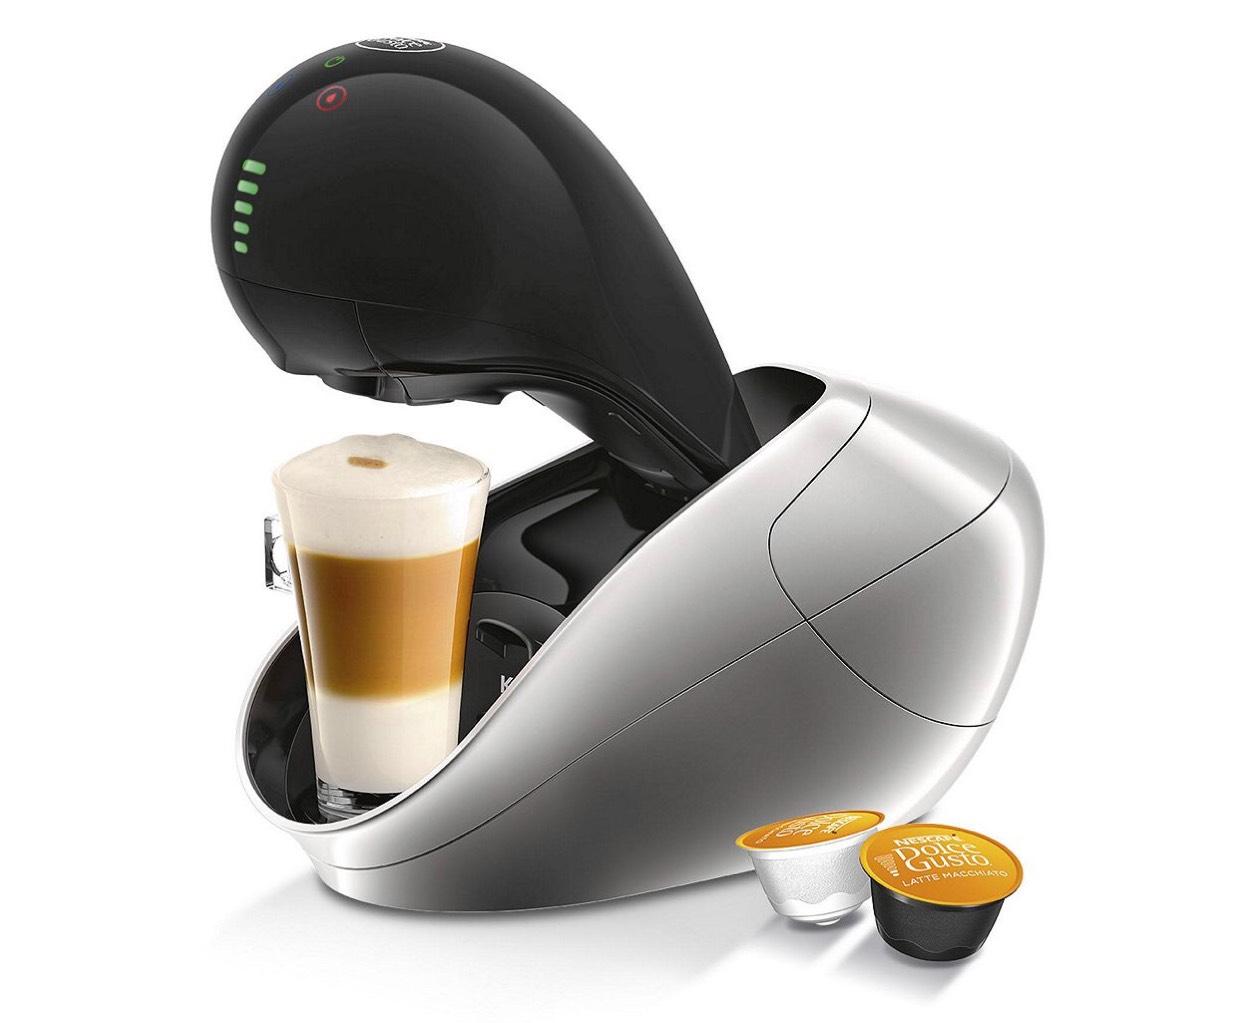 Nescafe Dolce Gusto Movenza Coffee Machine inc £50 credit - £79 @ Tesco Direct